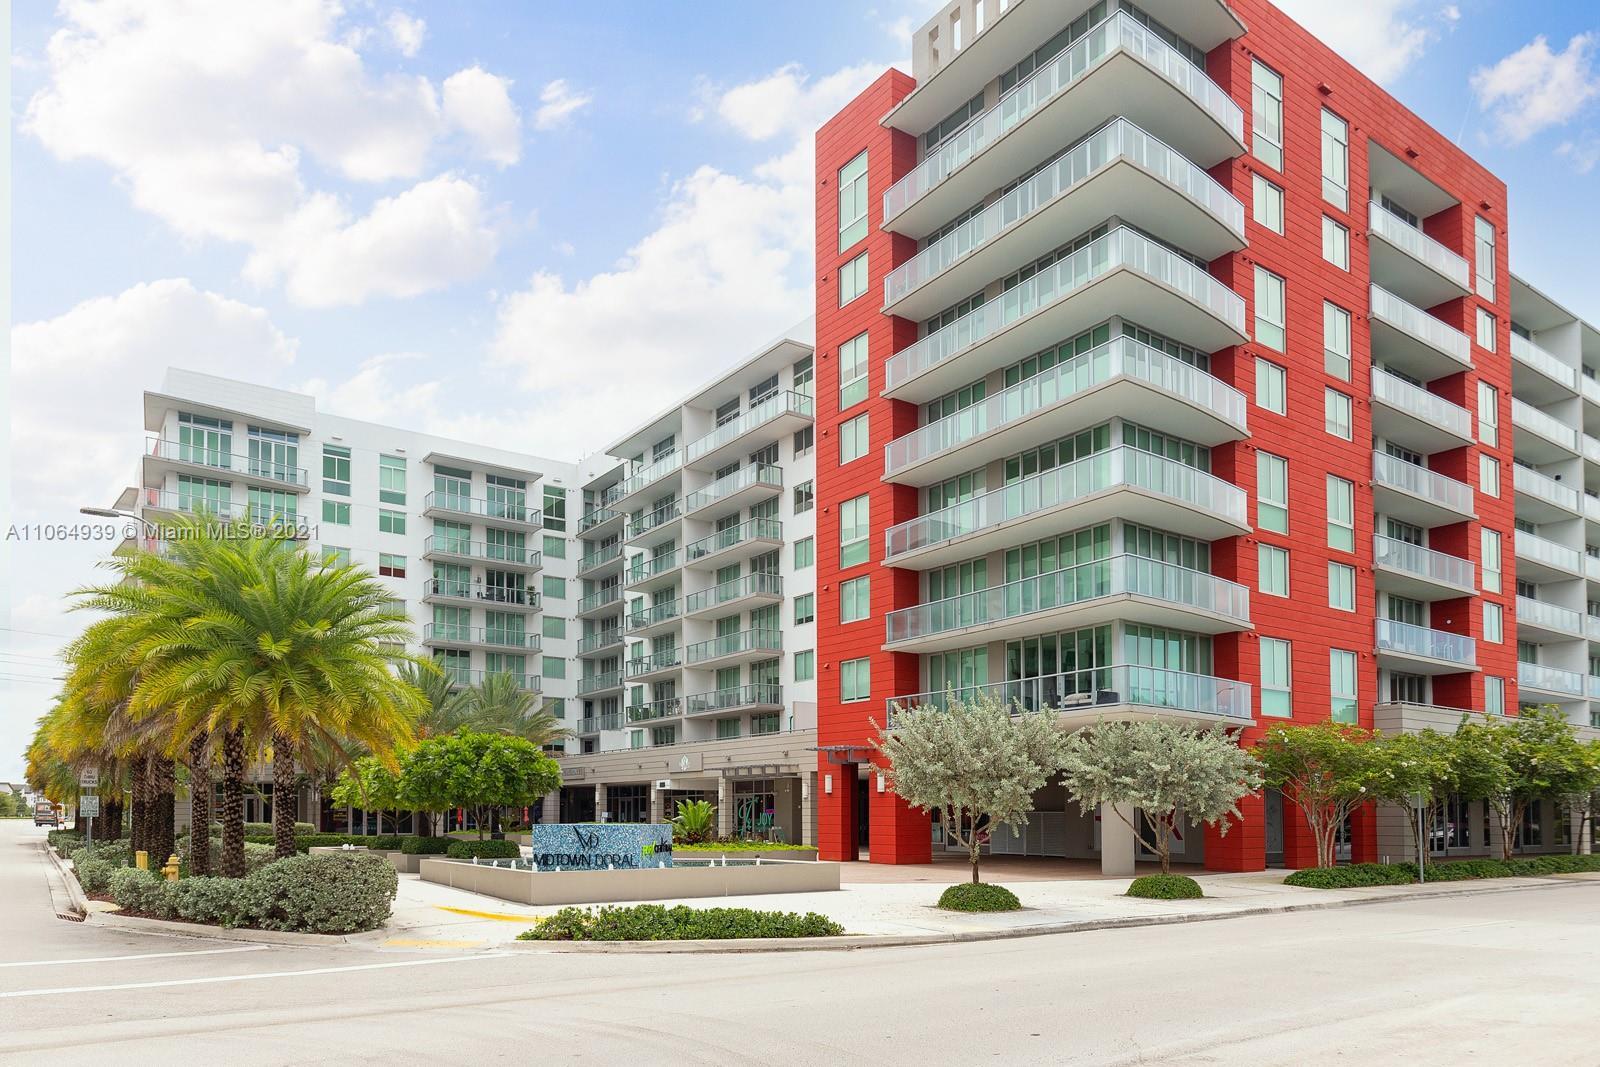 7661 107 Ave Unit , Doral, Florida 33178